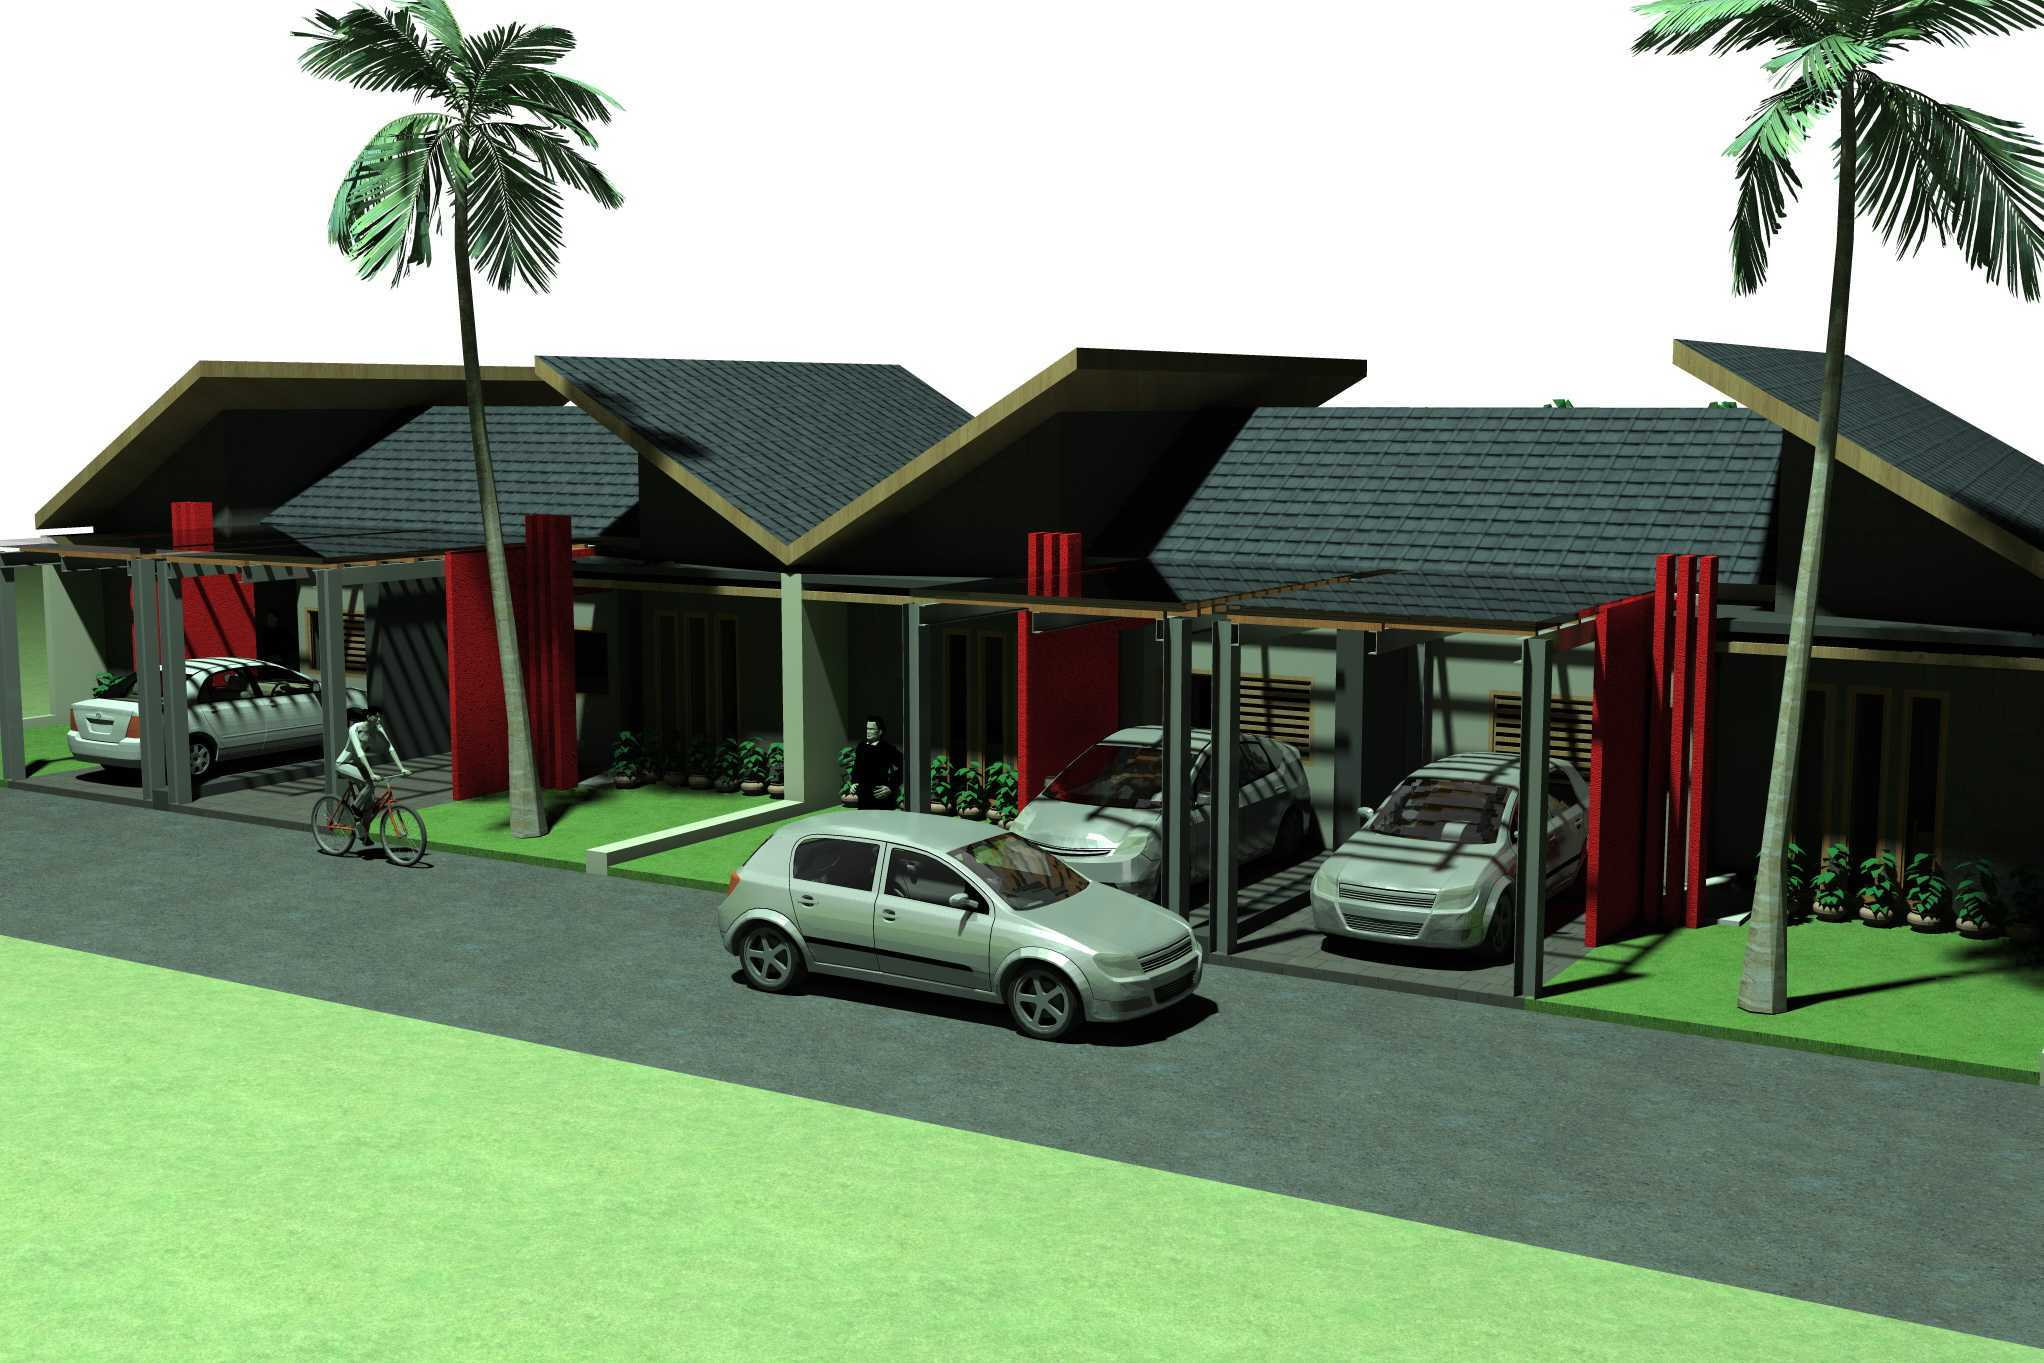 Afina Rahmani Design Mini Cluster Batujajar, Bandung Batujajar, Bandung View-2 Minimalis  24058